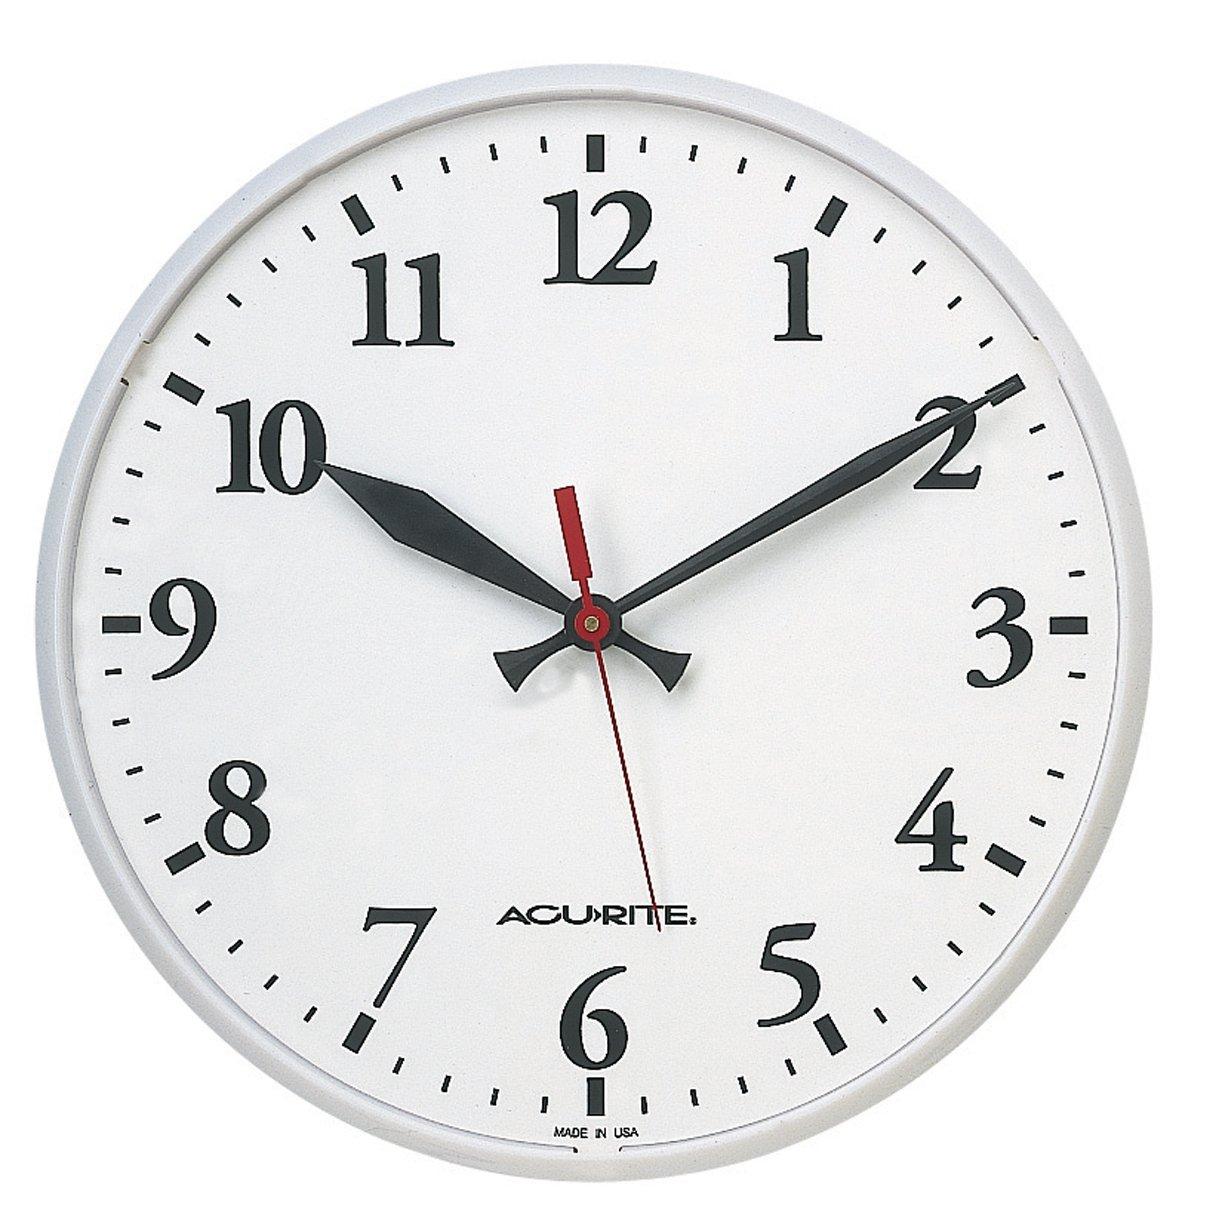 Amazon.com: AcuRite 1960 12.5-Inch Indoor or Outdoor Clock: Home ...